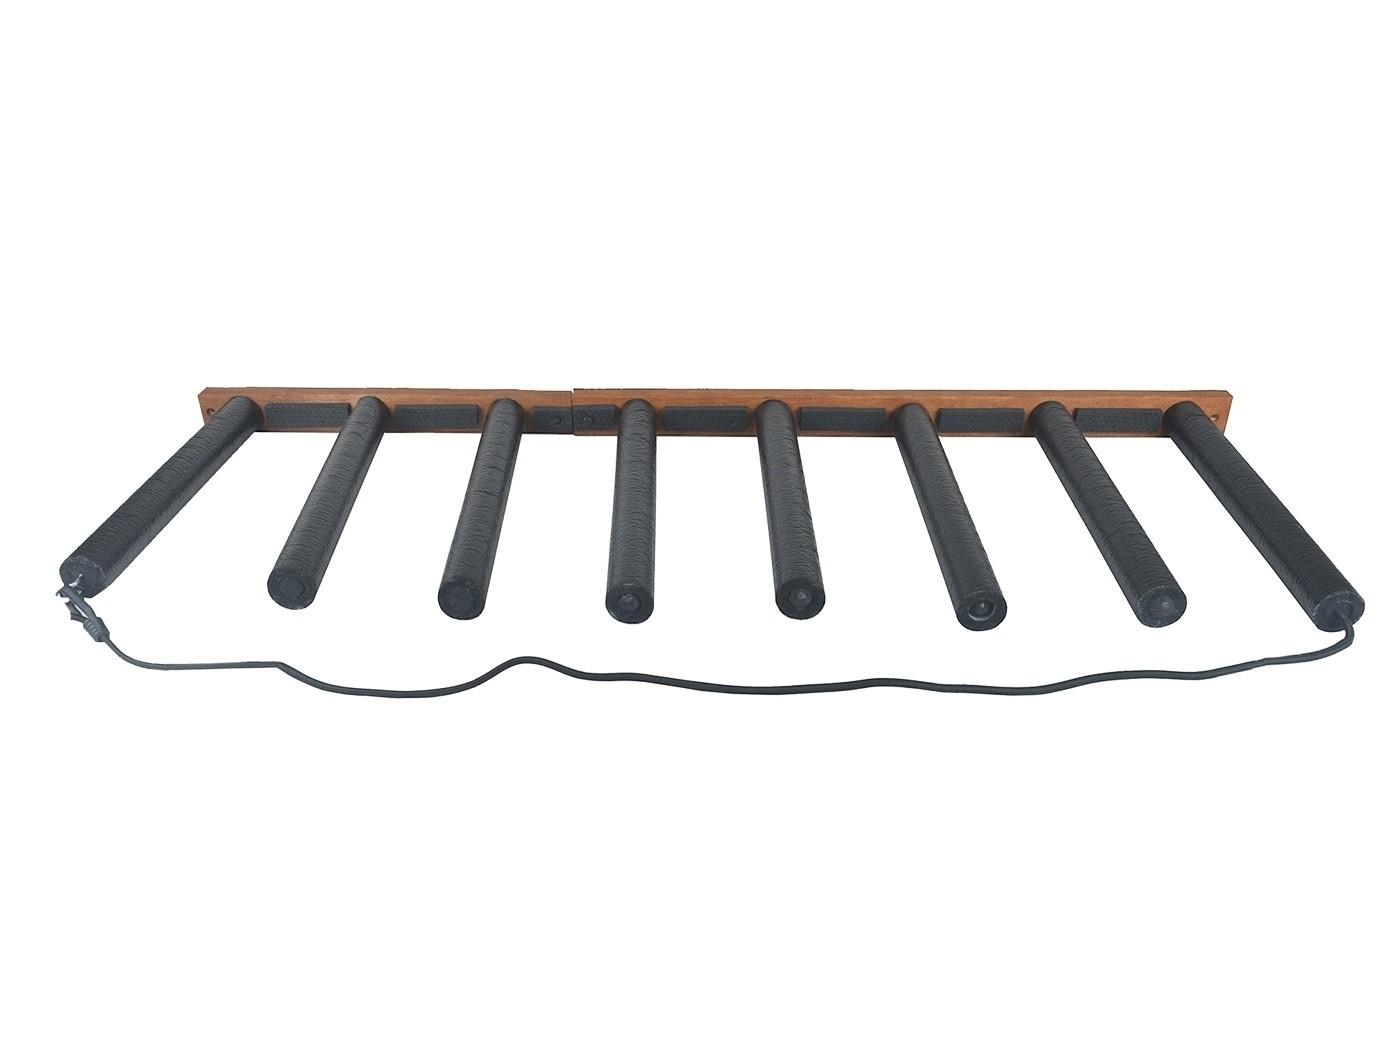 Rack Para 7 Pranchas de Stand Up Paddle - Vertical - Madeira | Prancharia